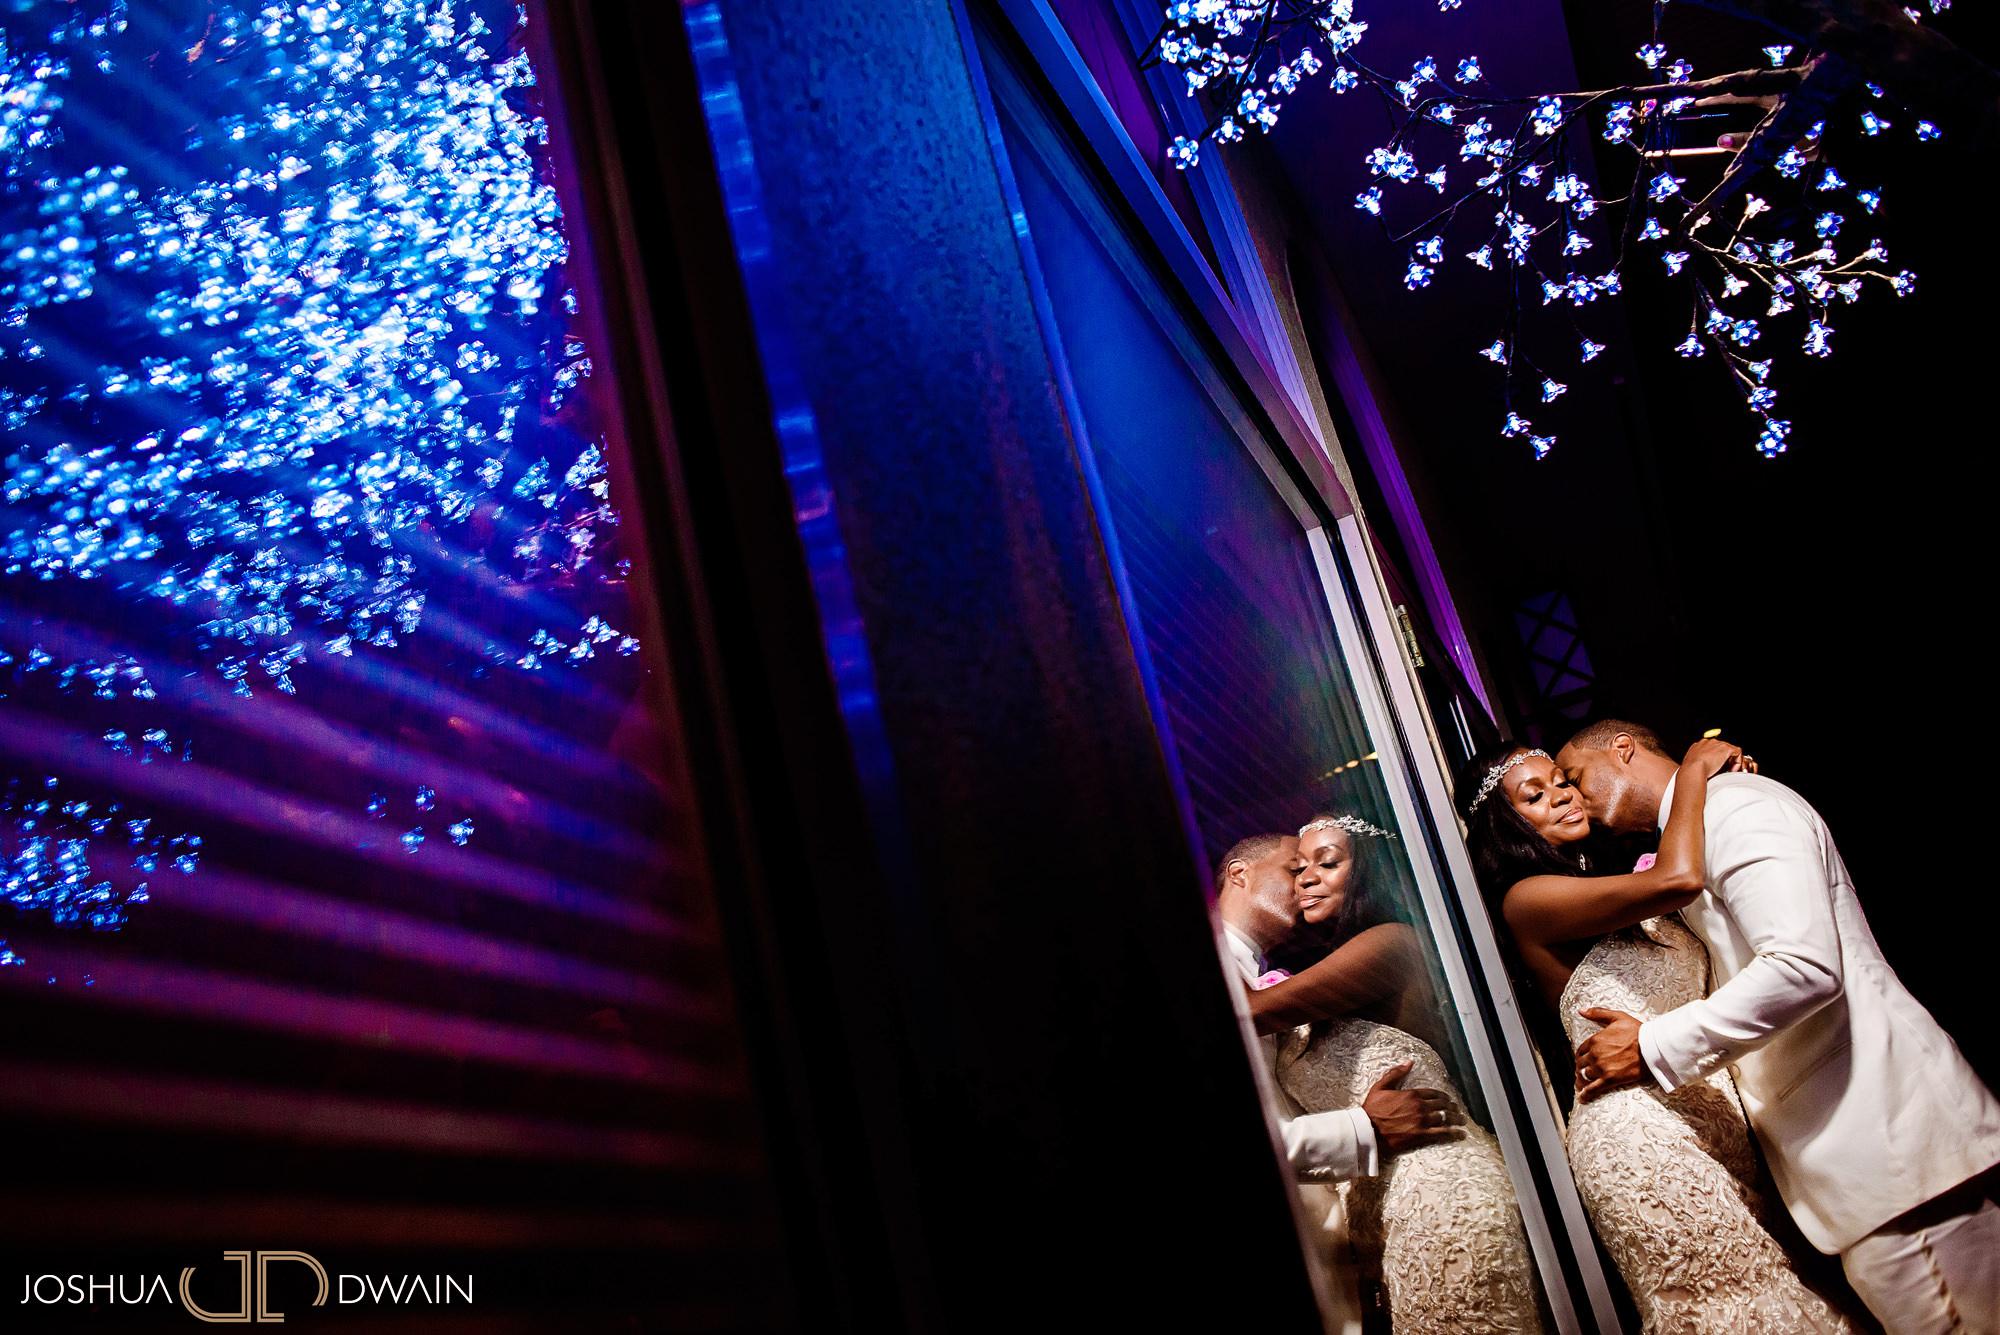 joshua-dwain-weddings-gallery-best-wedding-photographers-us-010